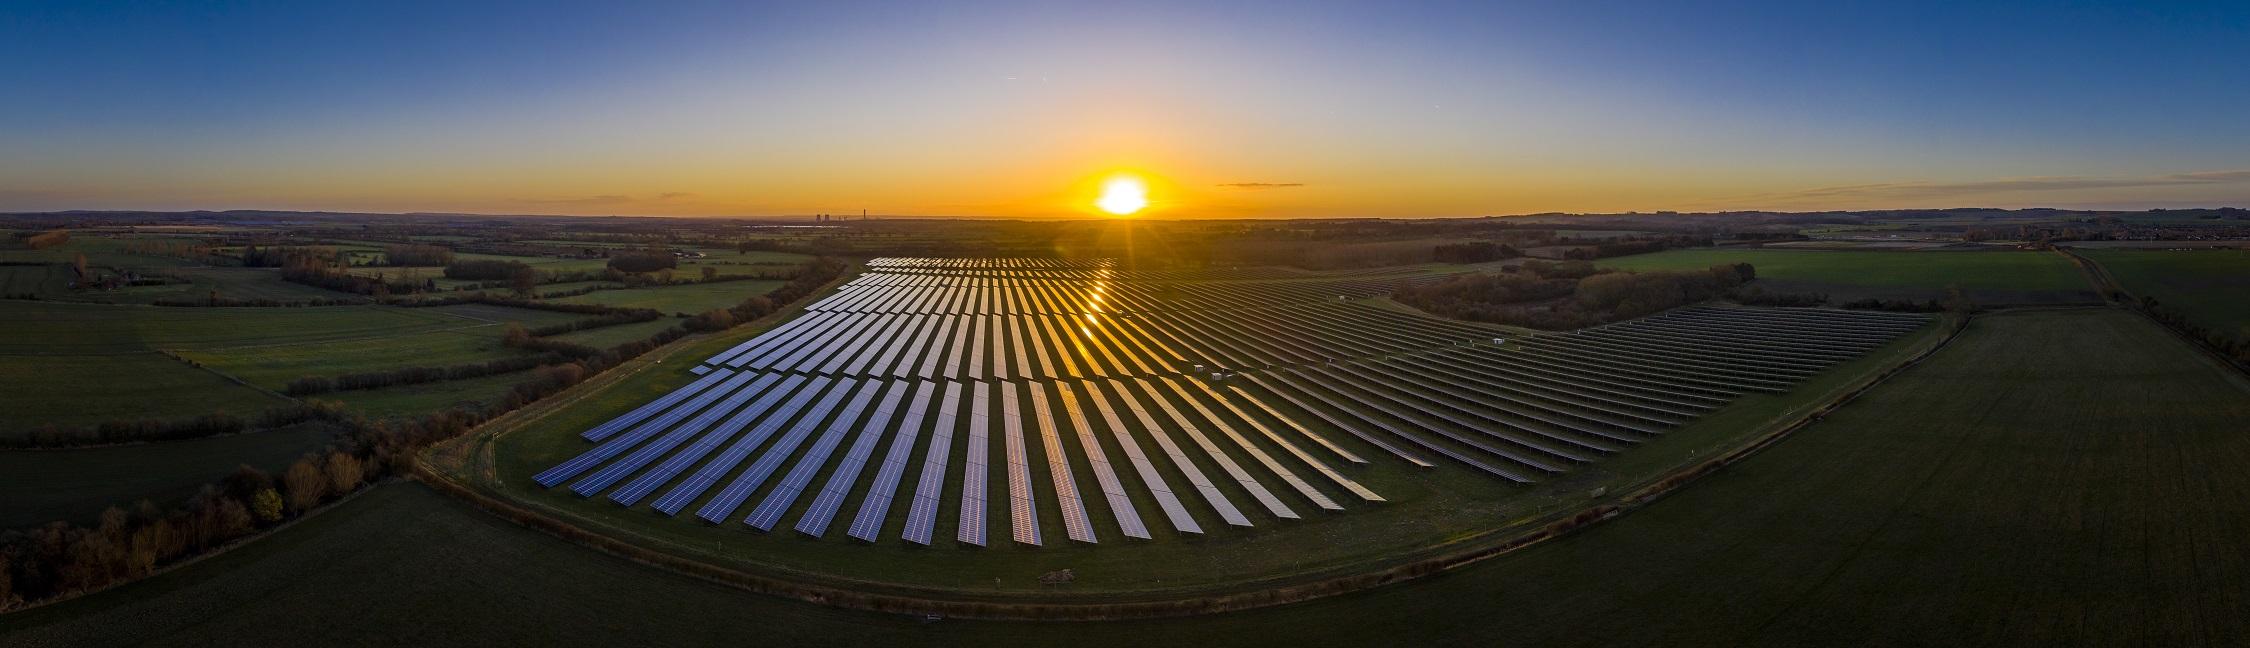 Impianti-fotovoltaici-in-Sardegna-2